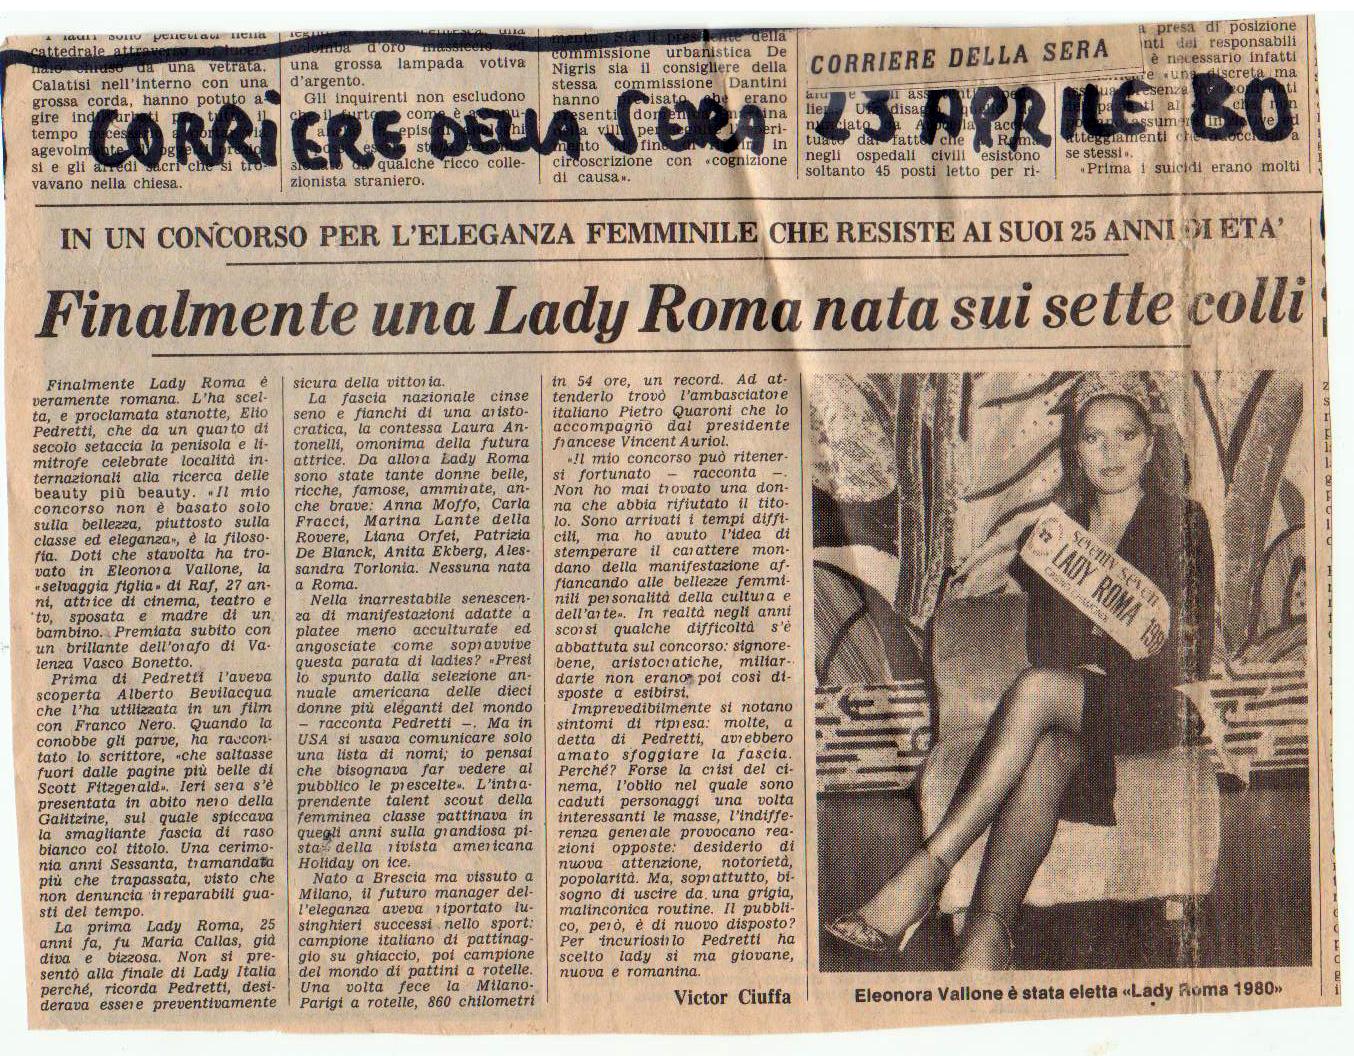 Forum on this topic: Olive Carey, joy-viado-1959-016/